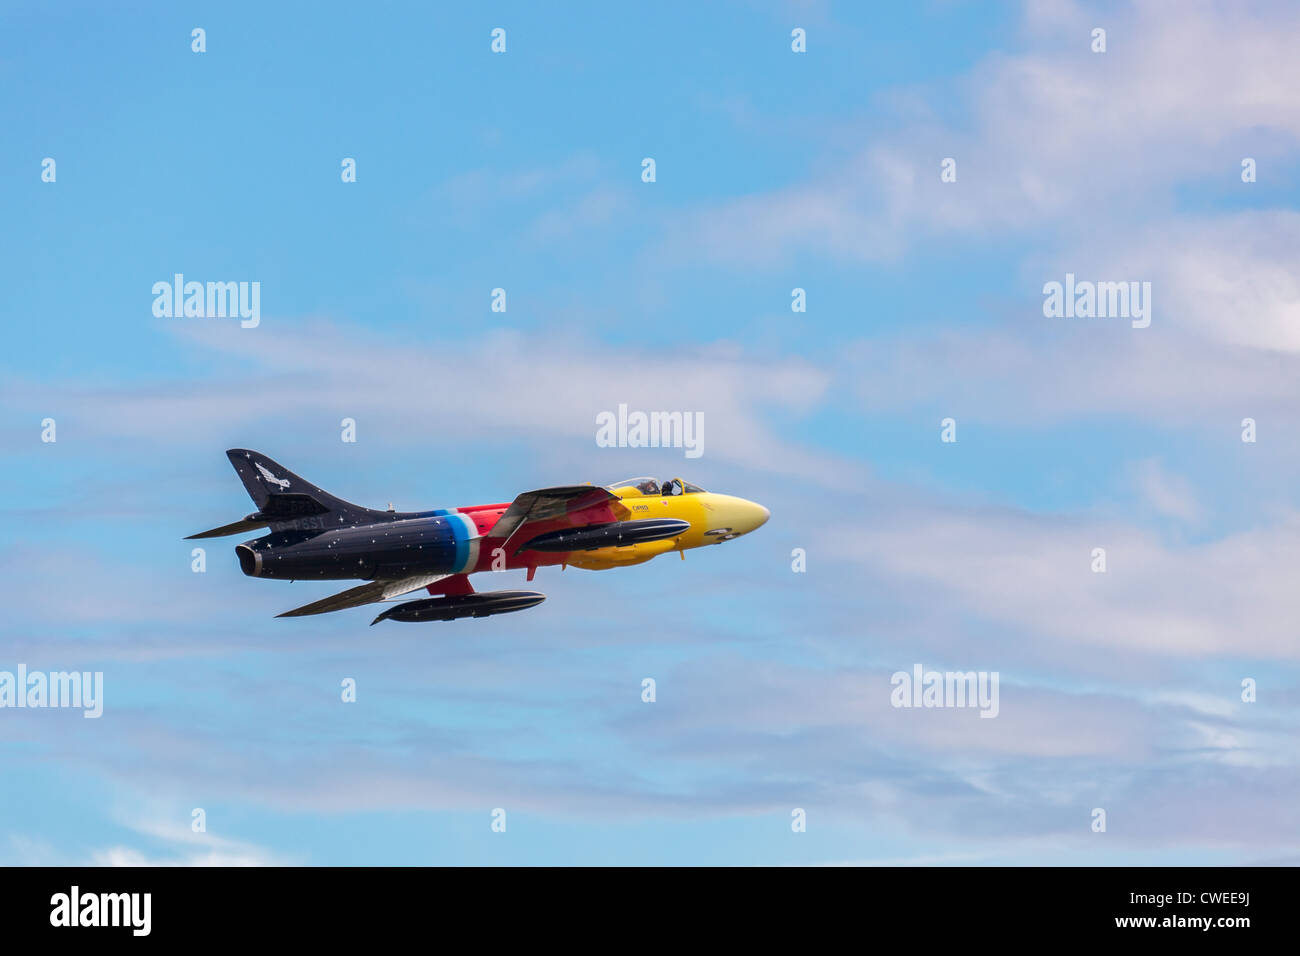 Hawker Hunter Miss Demeanour aerial display at Shoreham Airshow Stock Photo